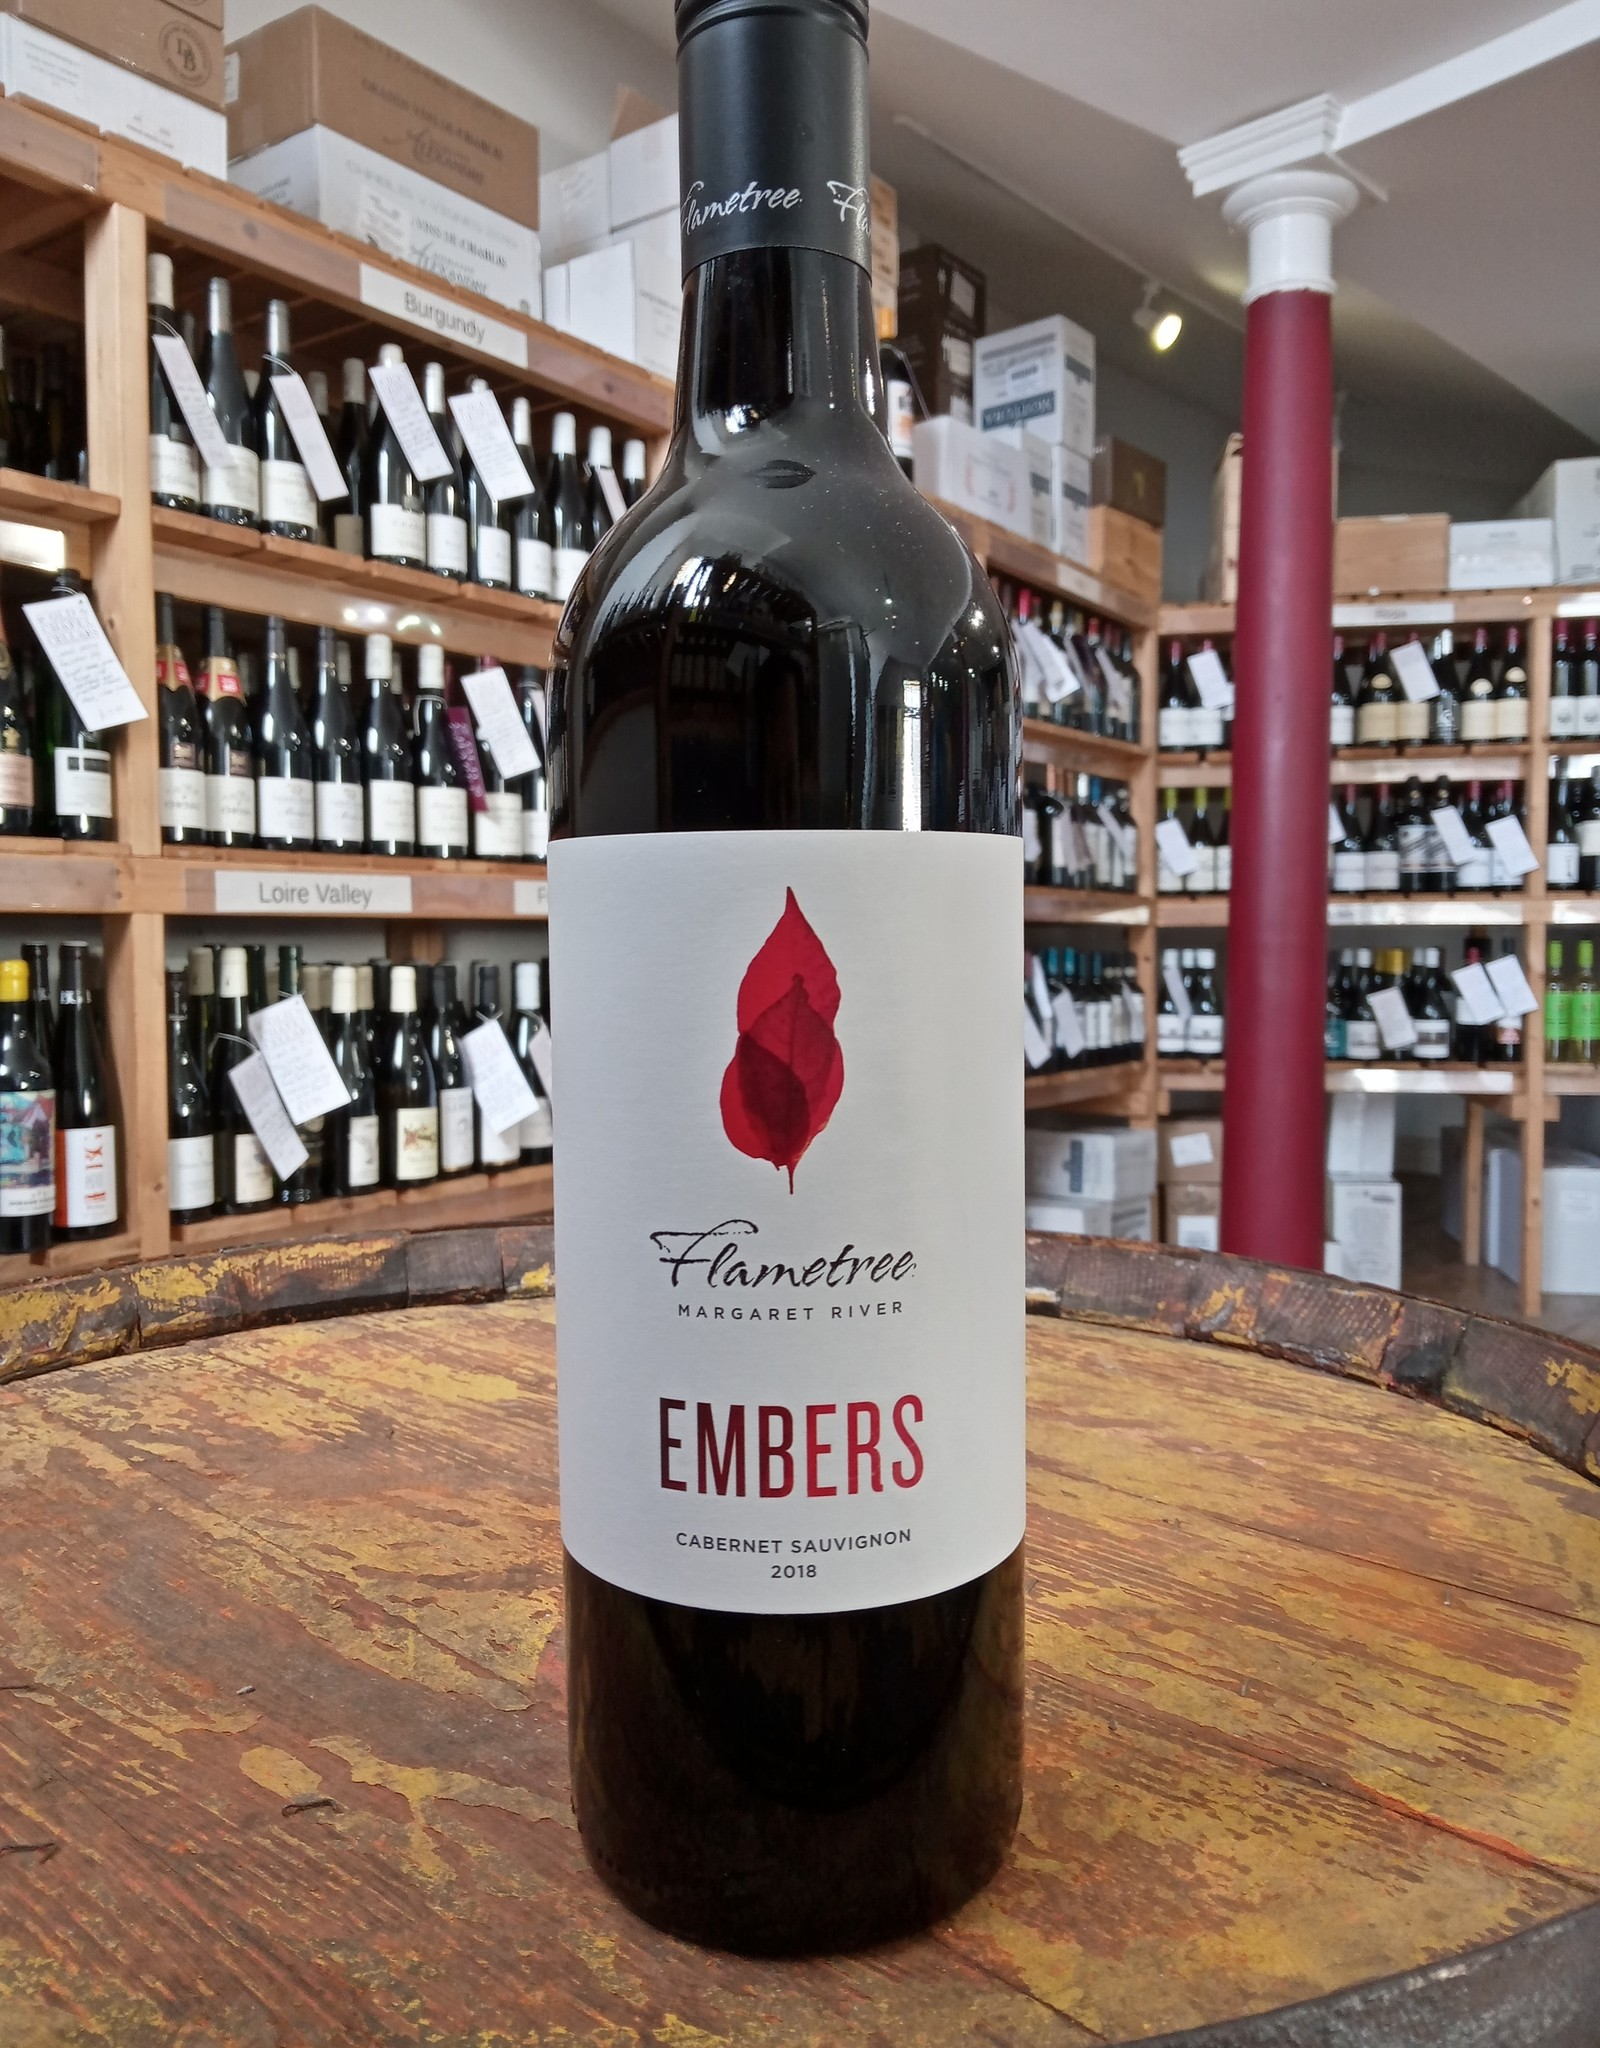 Flametree 2018 Embers Cabernet Sauvignon, Margaret River